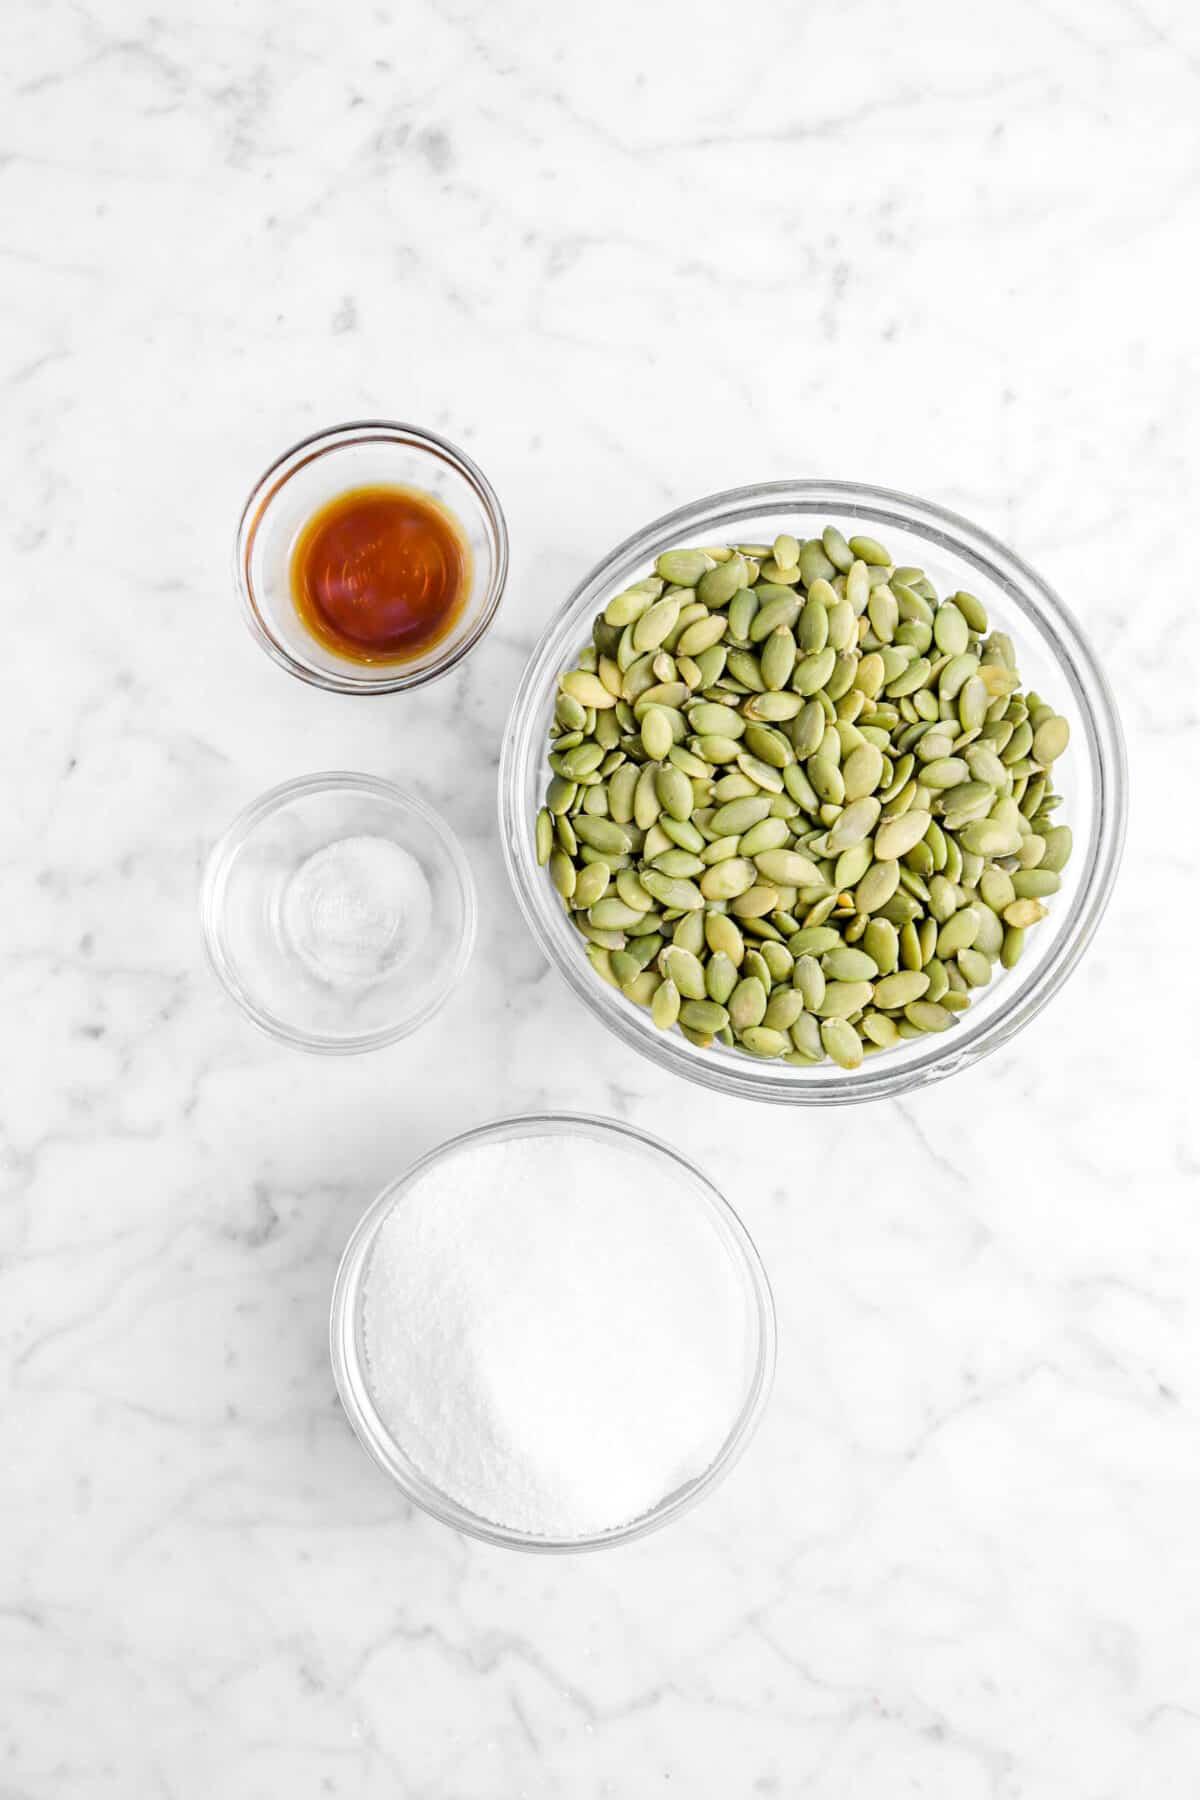 vanilla, salt, sugar, and pumpkin seeds in glass bowls